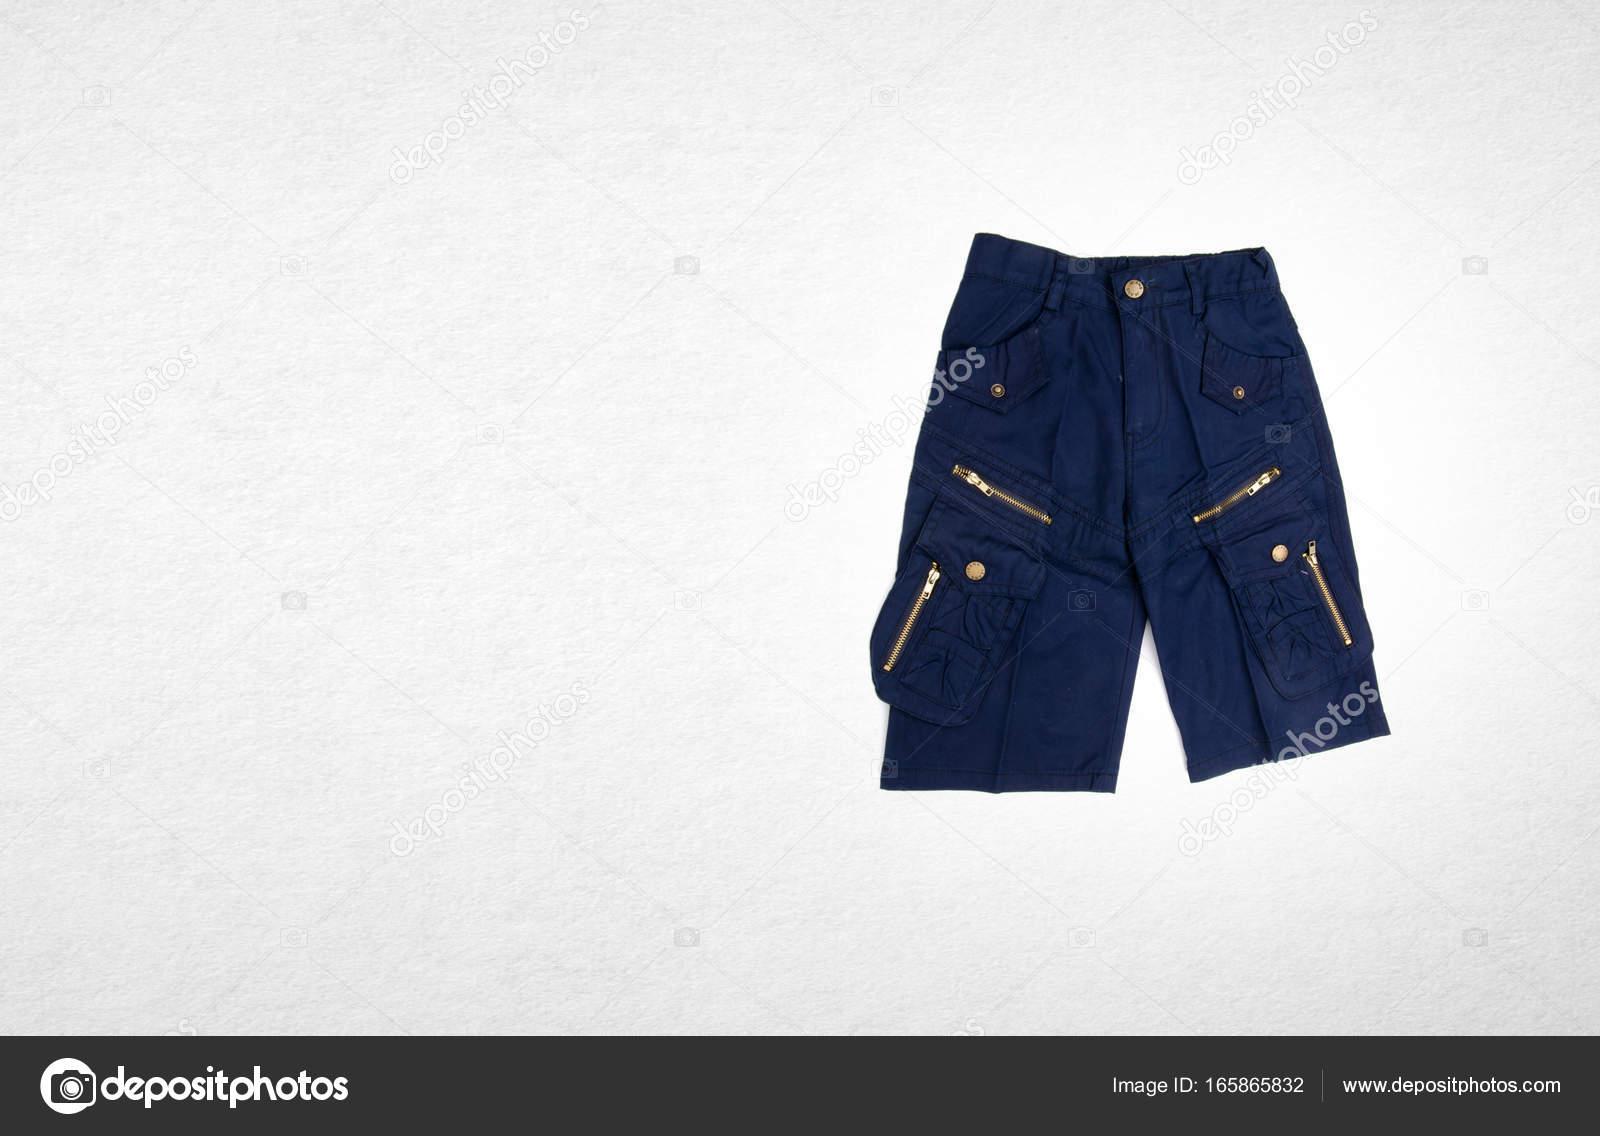 5eec06ba608 Του παντελονιού ή του παιδιού σορτς της λαχανιάζω στο παρασκήνιο —  Φωτογραφία Αρχείου